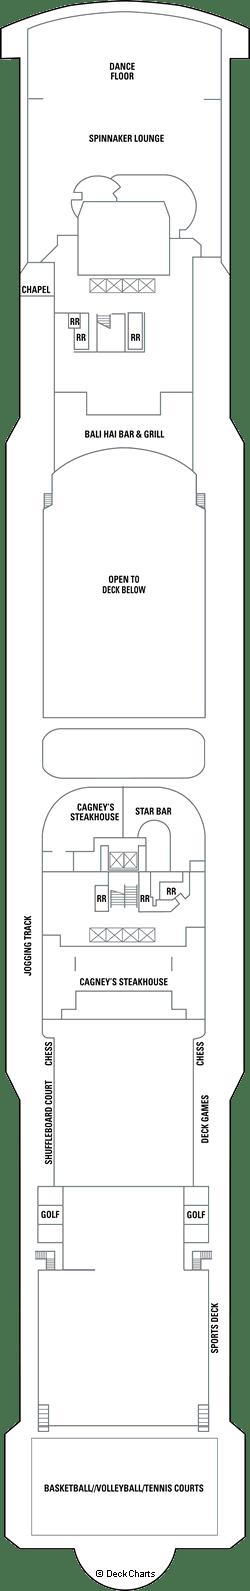 Norwegian Jade Deck Plans, Ship Layout & Staterooms